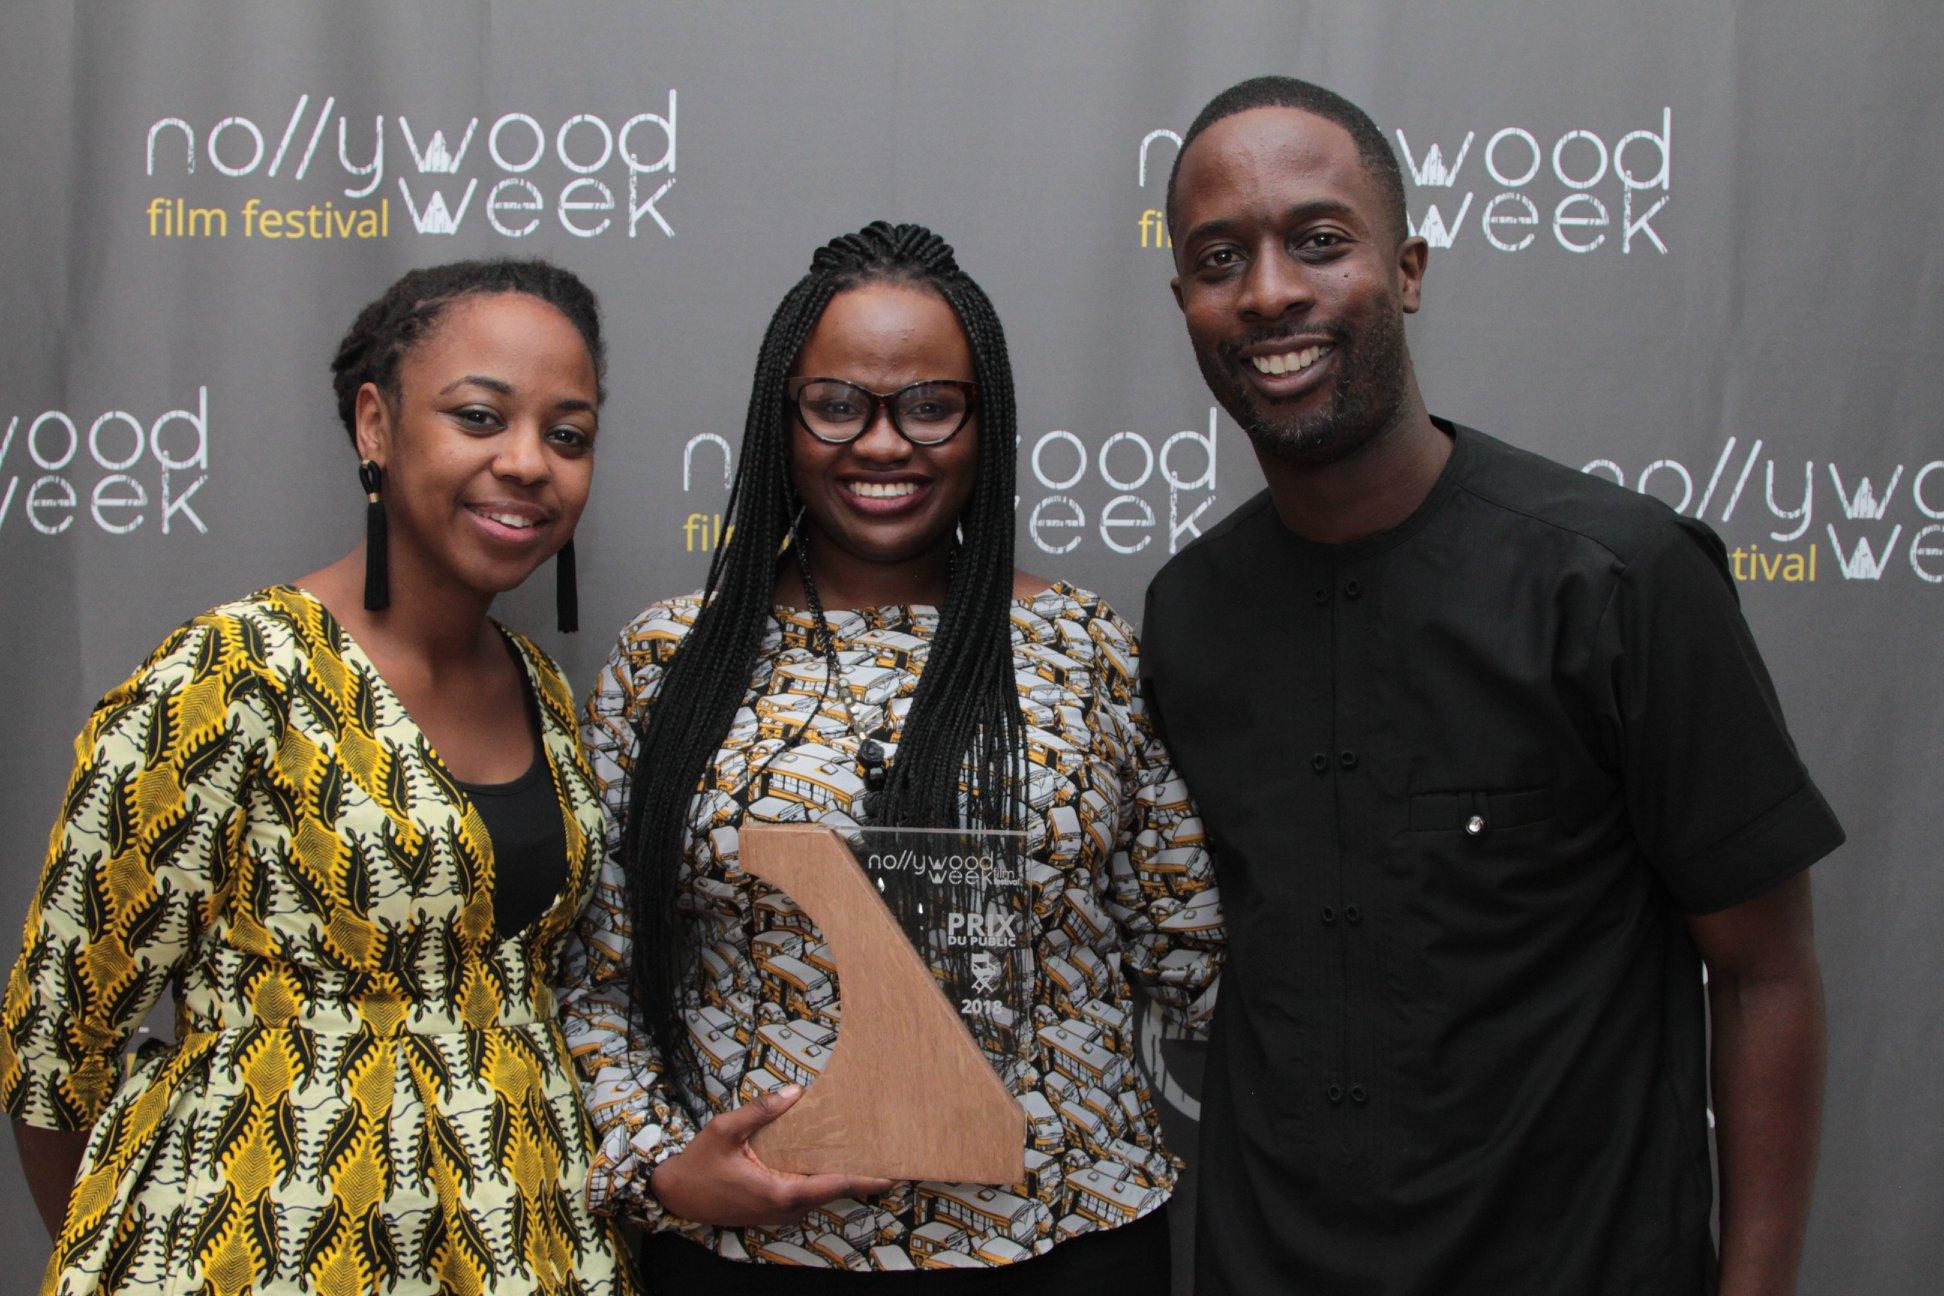 Nollywood Week Paris Film Festival